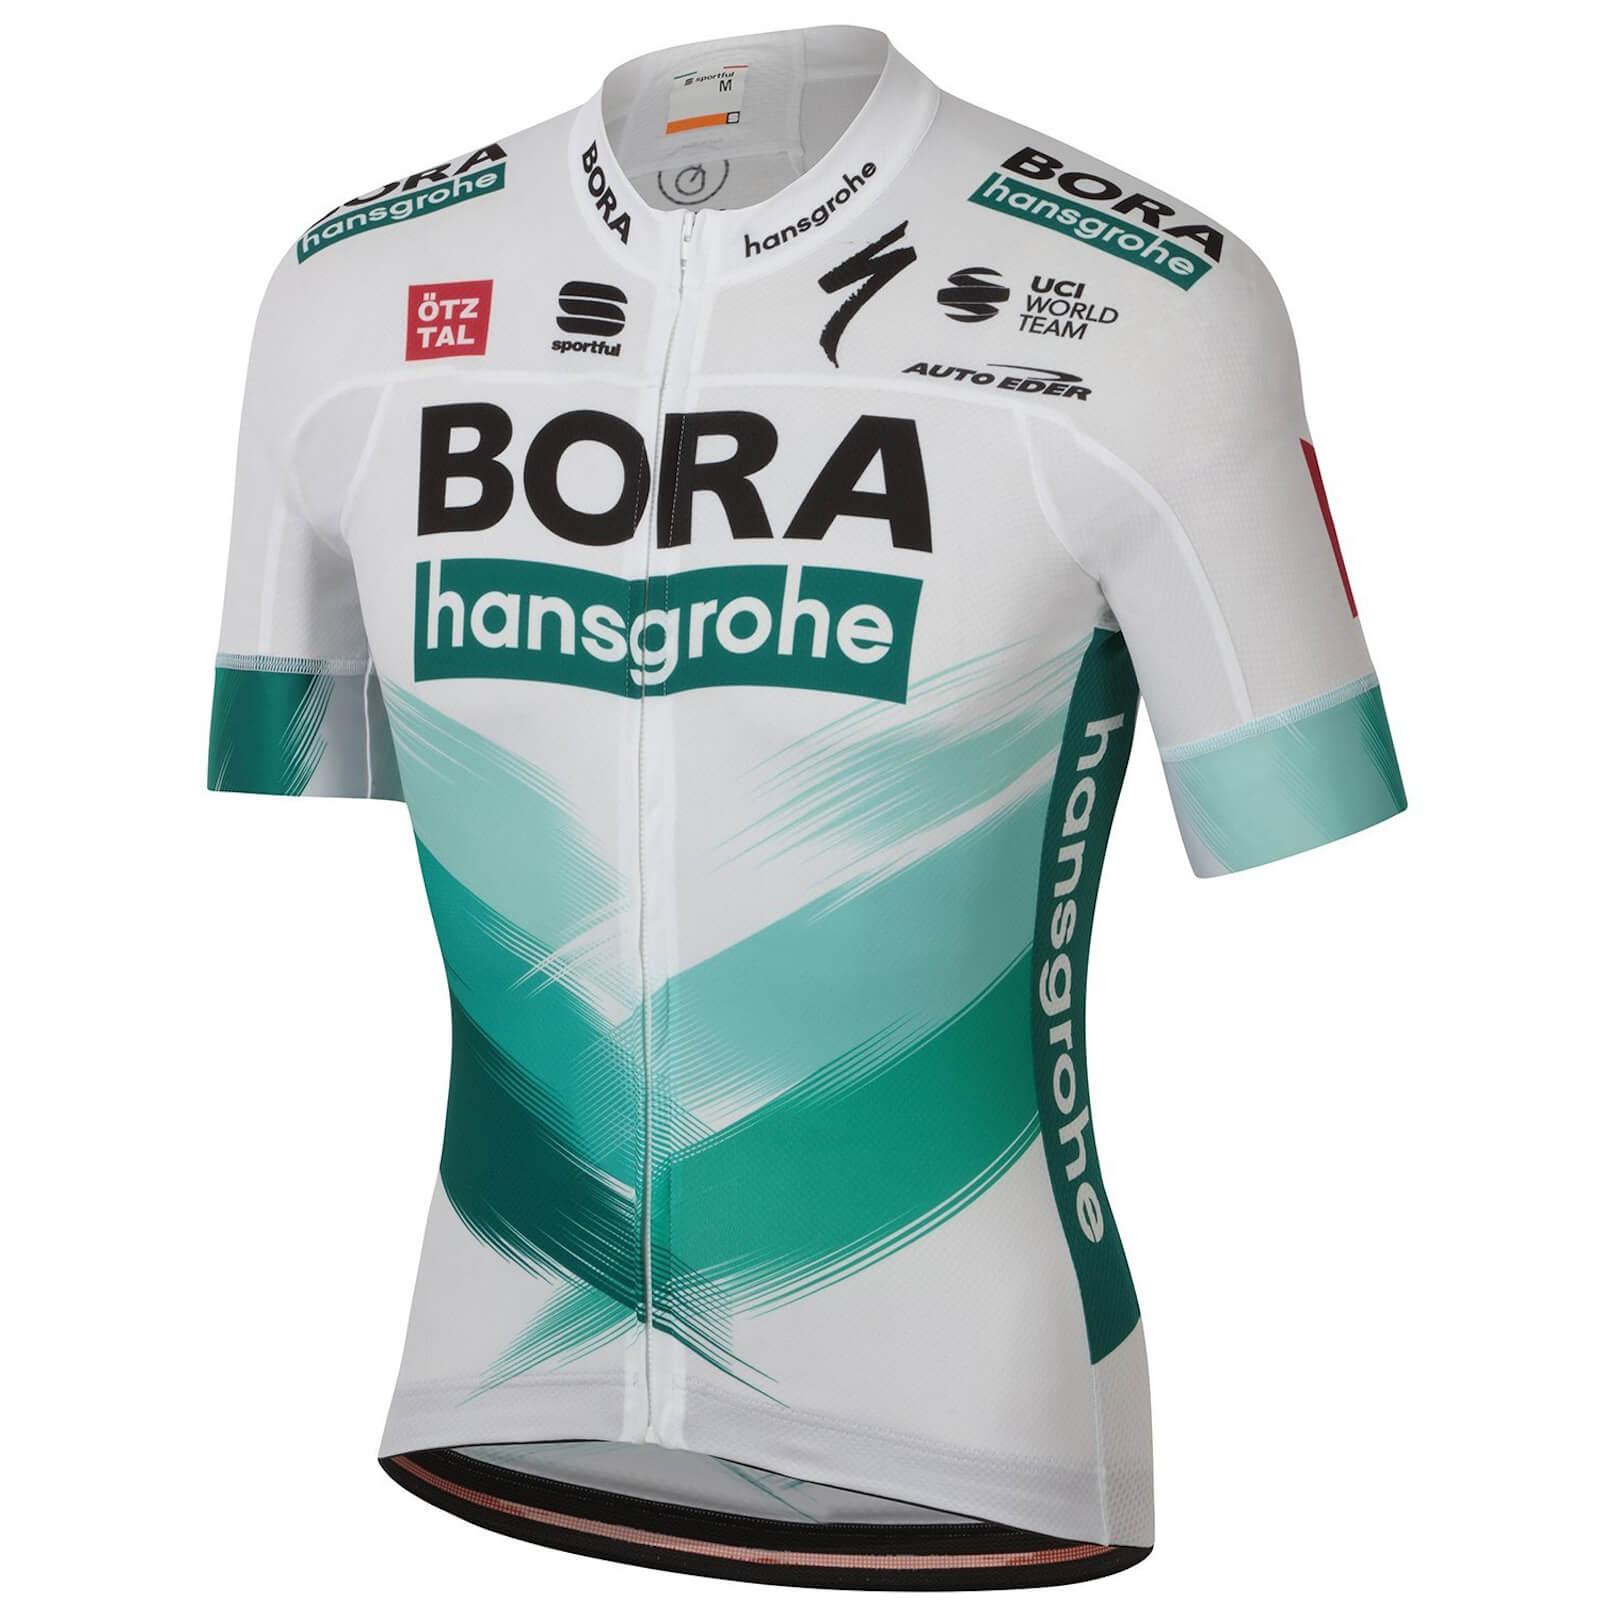 Sportful Bora Hansgrohe Tour de France Limited Edition BodyFit Team Jersey - L